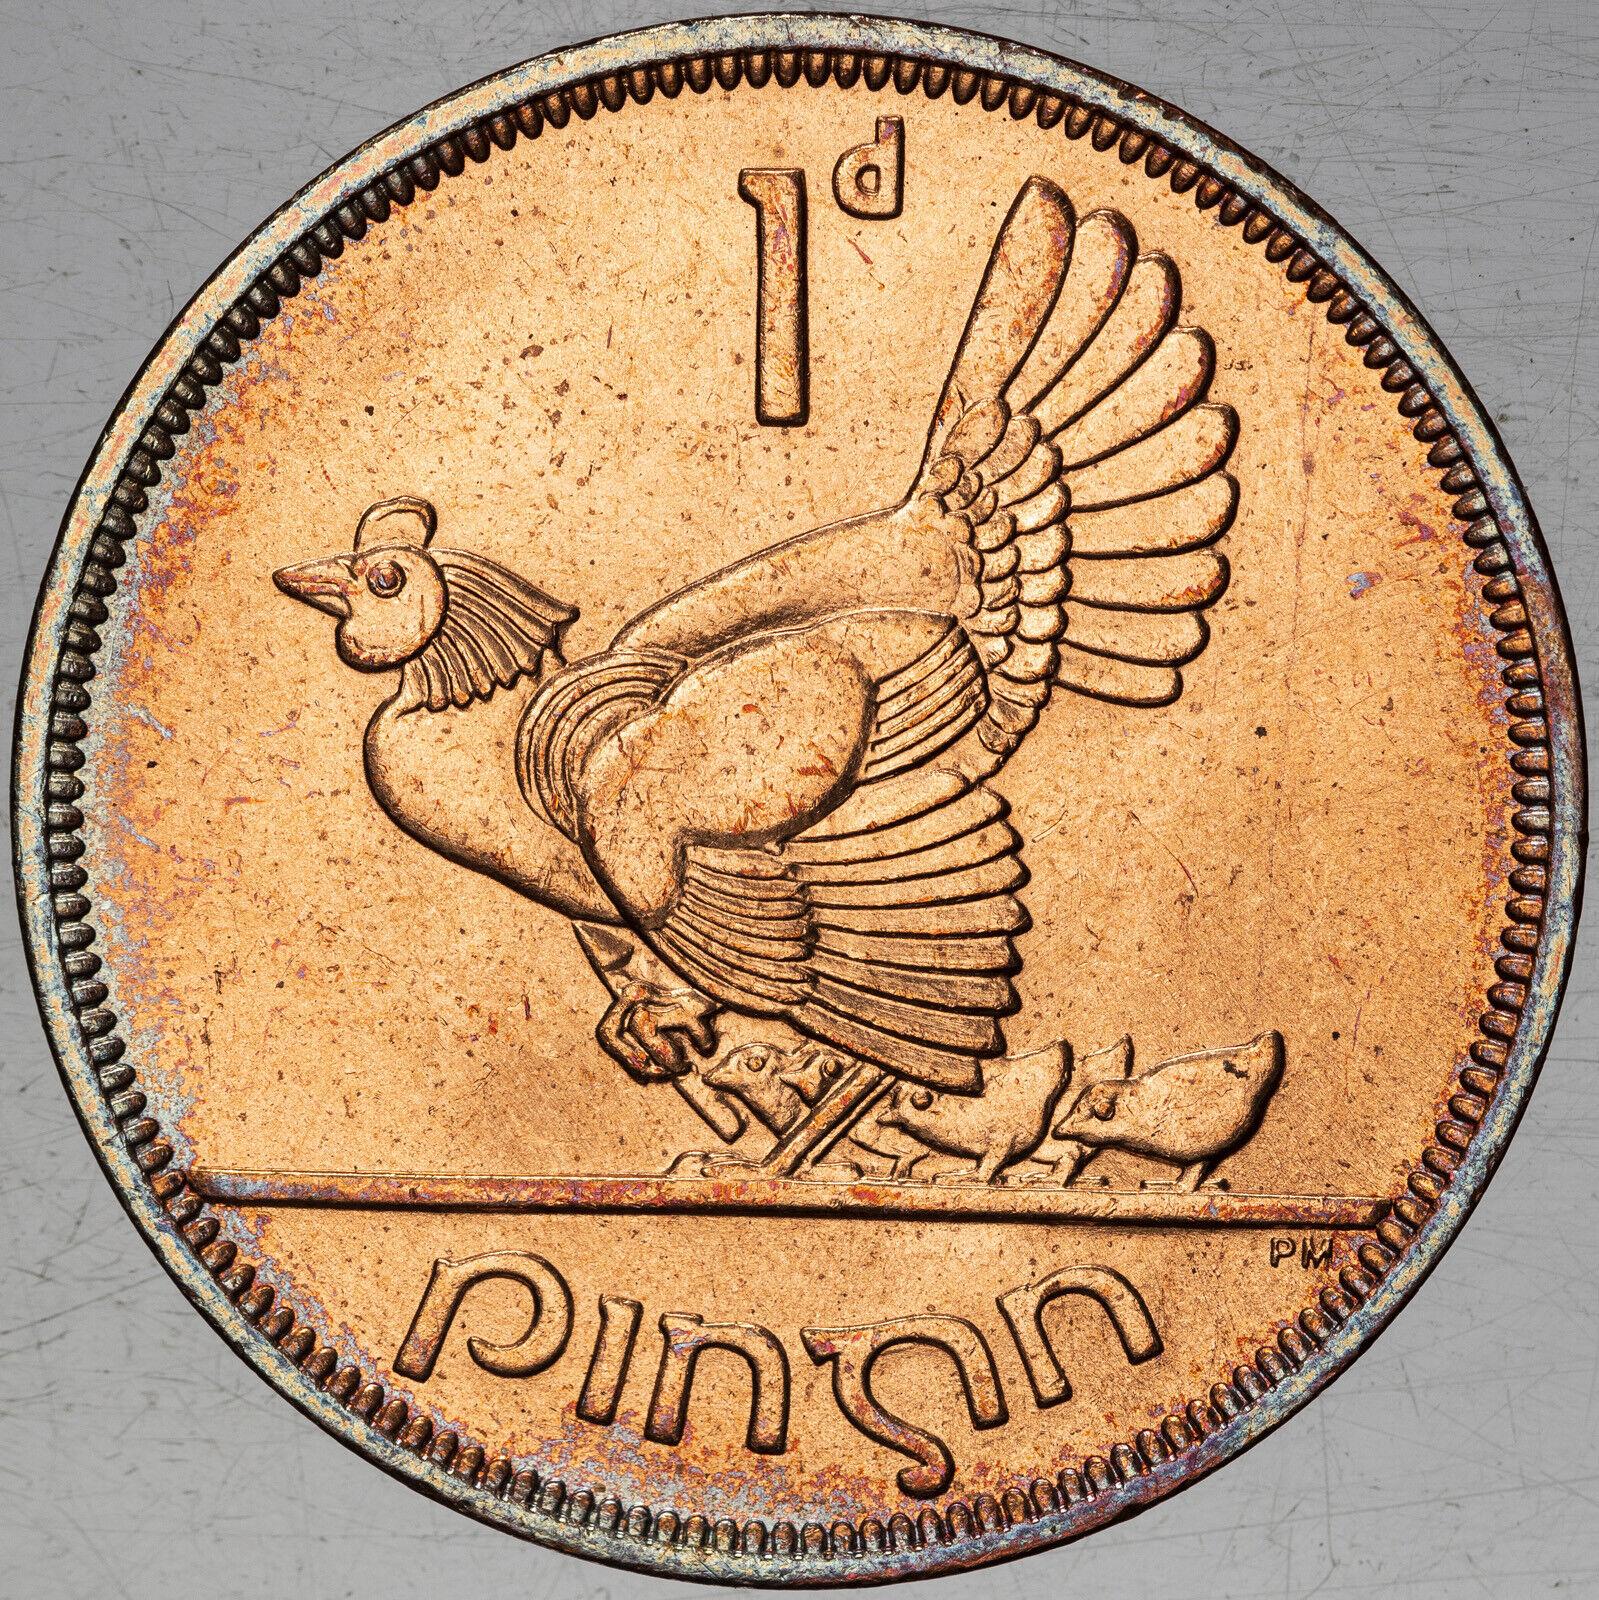 1968 IRELAND 1 PINGIN MS BU NATURAL TONED APPEAL SELECT GEM COIN COLORING - $33.75